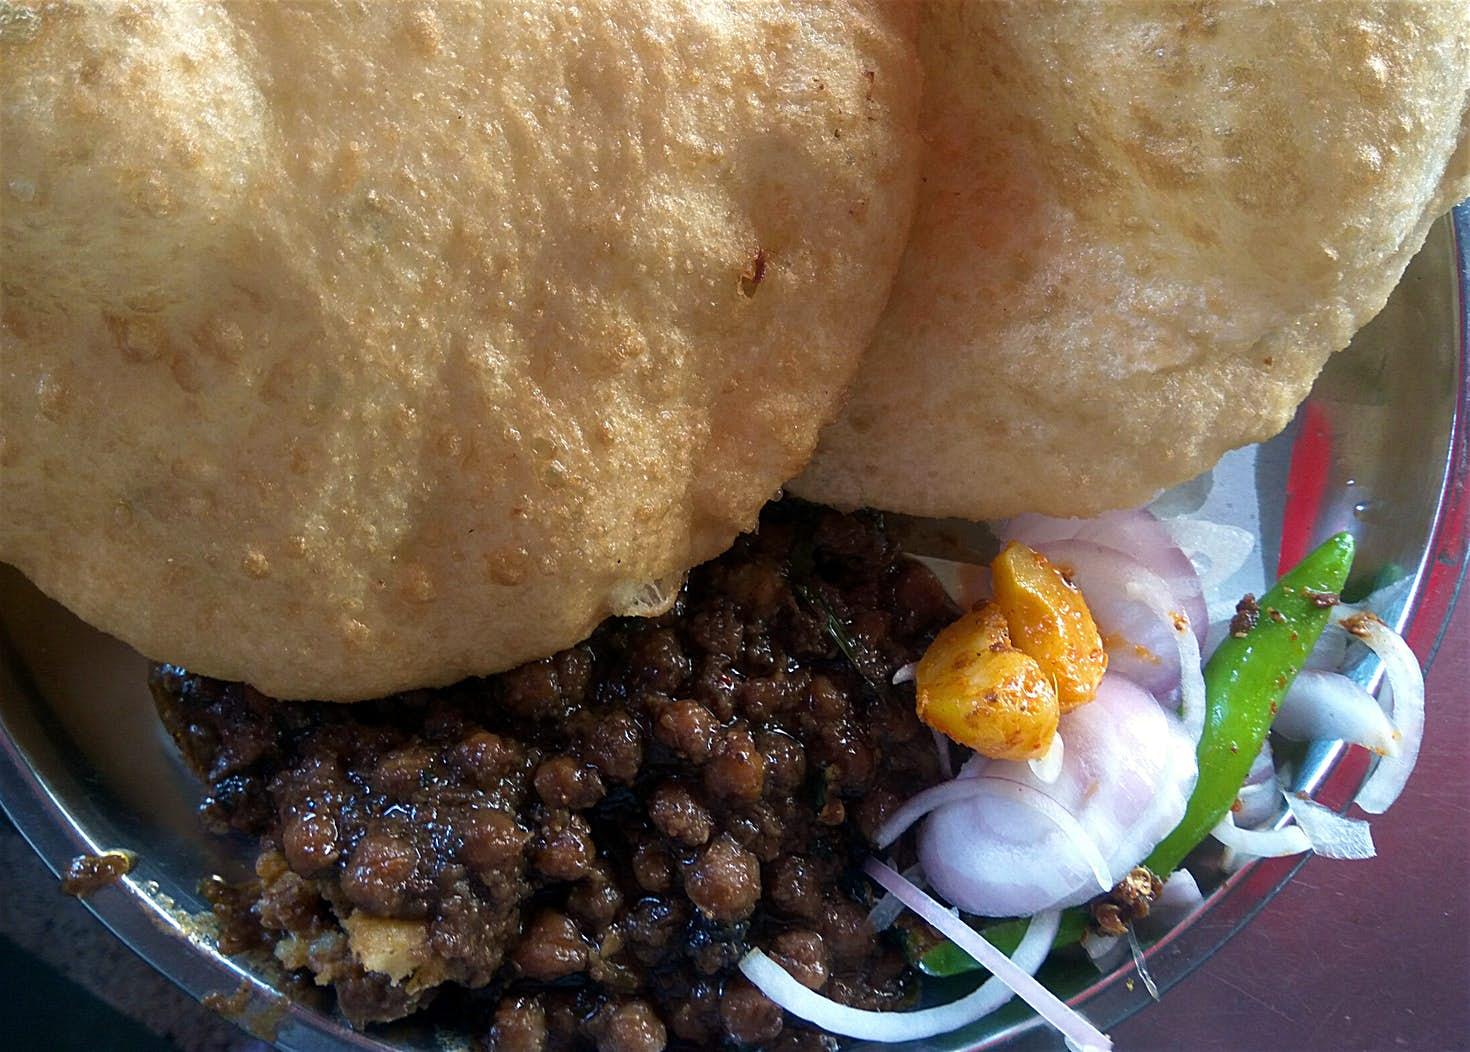 Breakfast bonhomie at Baba Nagpal Corner